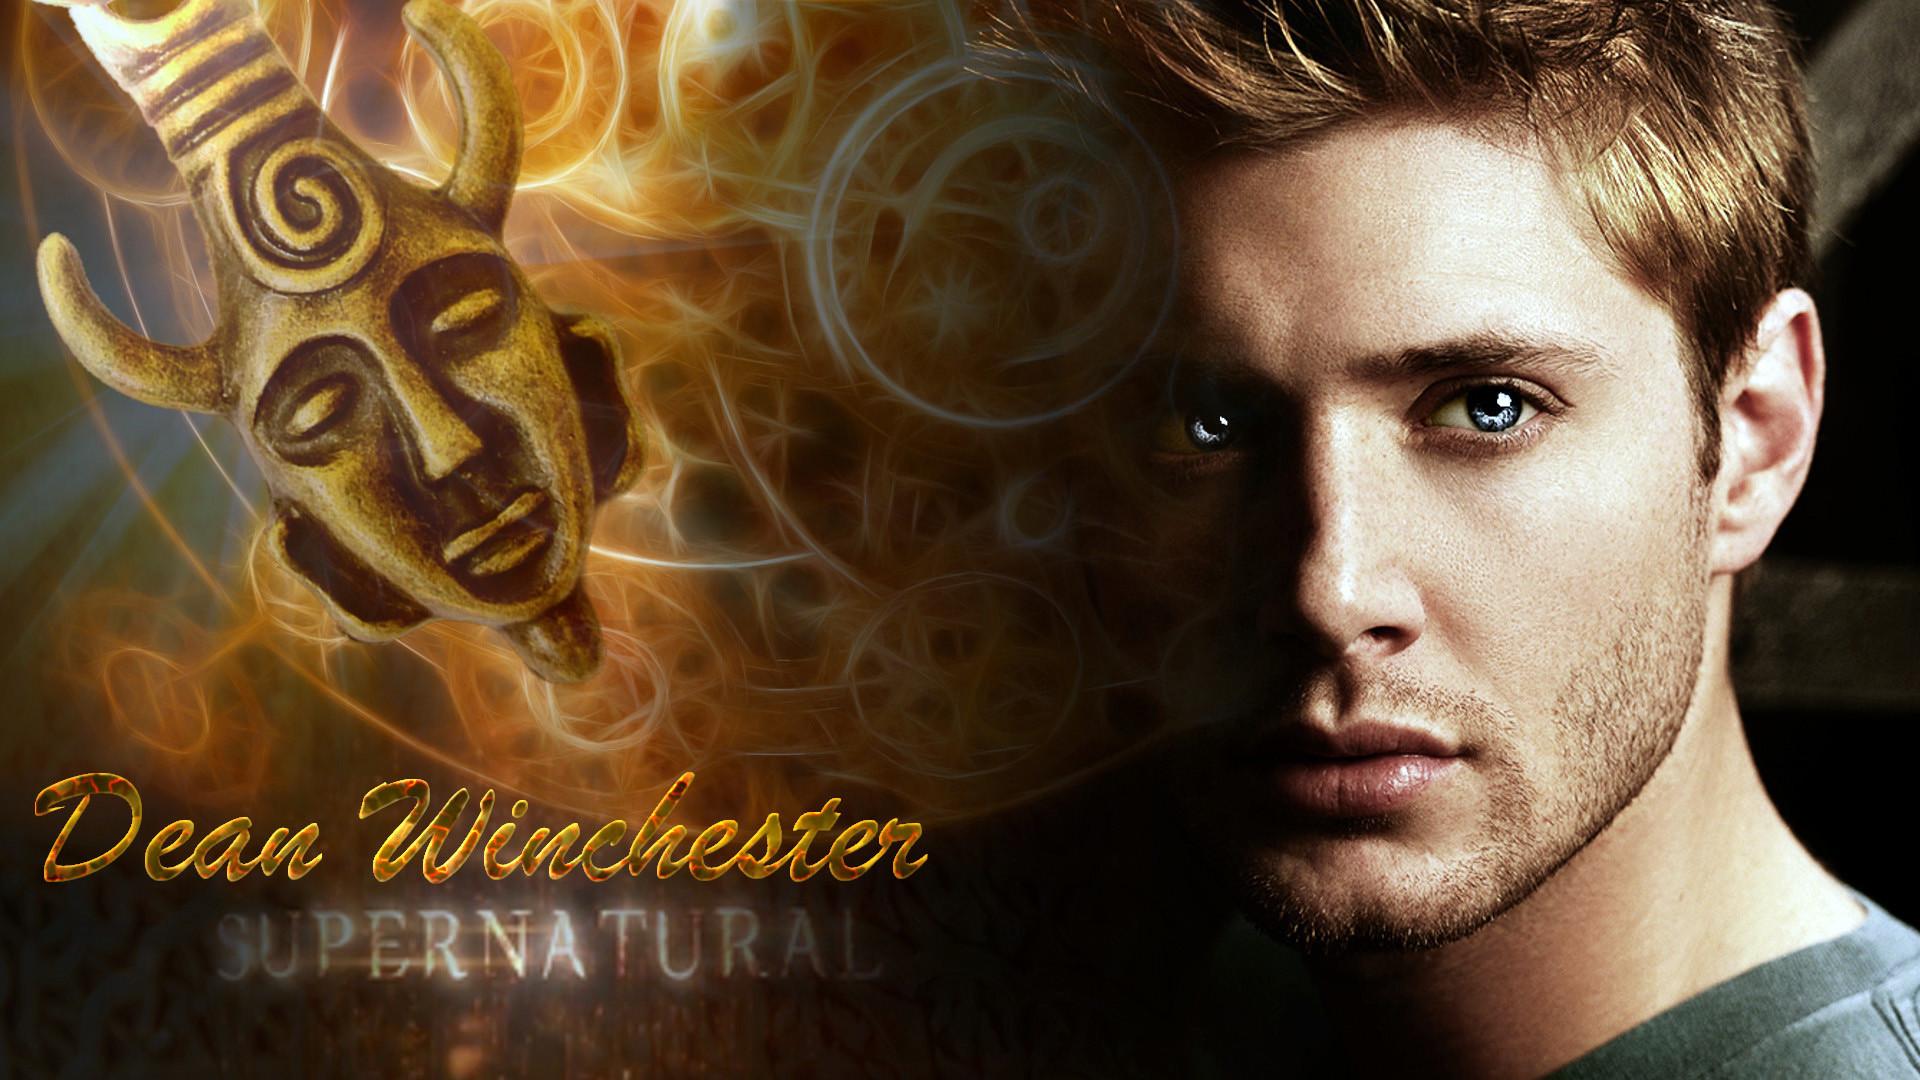 Sam and Dean Winchester Wallpaper – WallpaperSafari